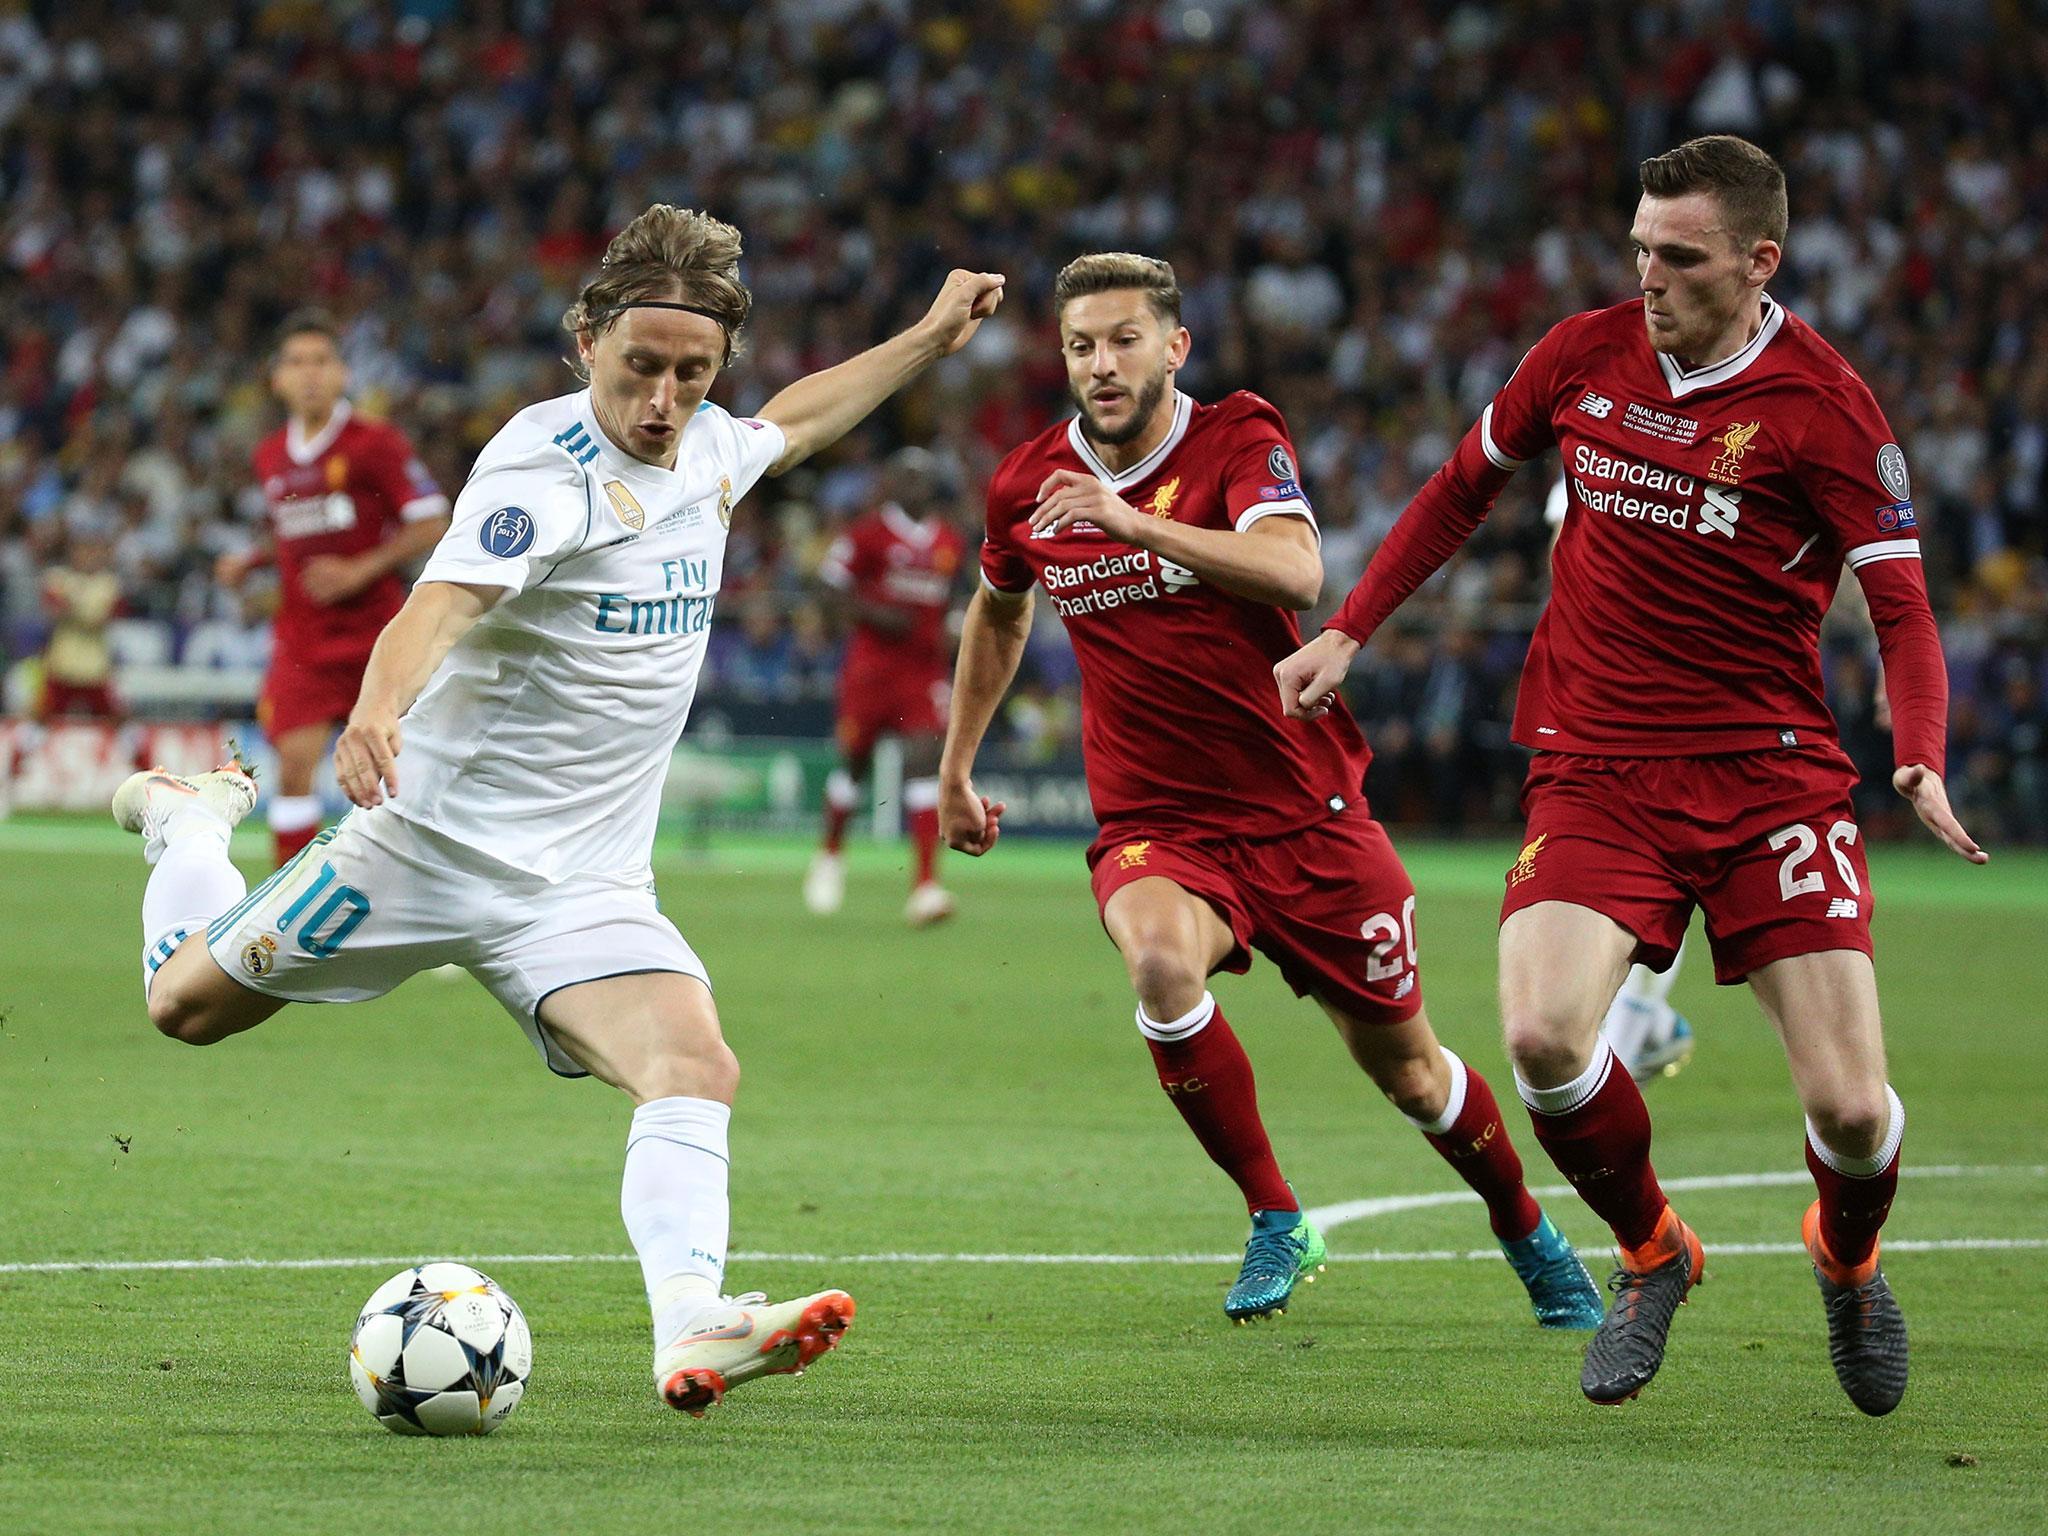 Liverpool sign Monaco's Fabinho on long-term contract   The